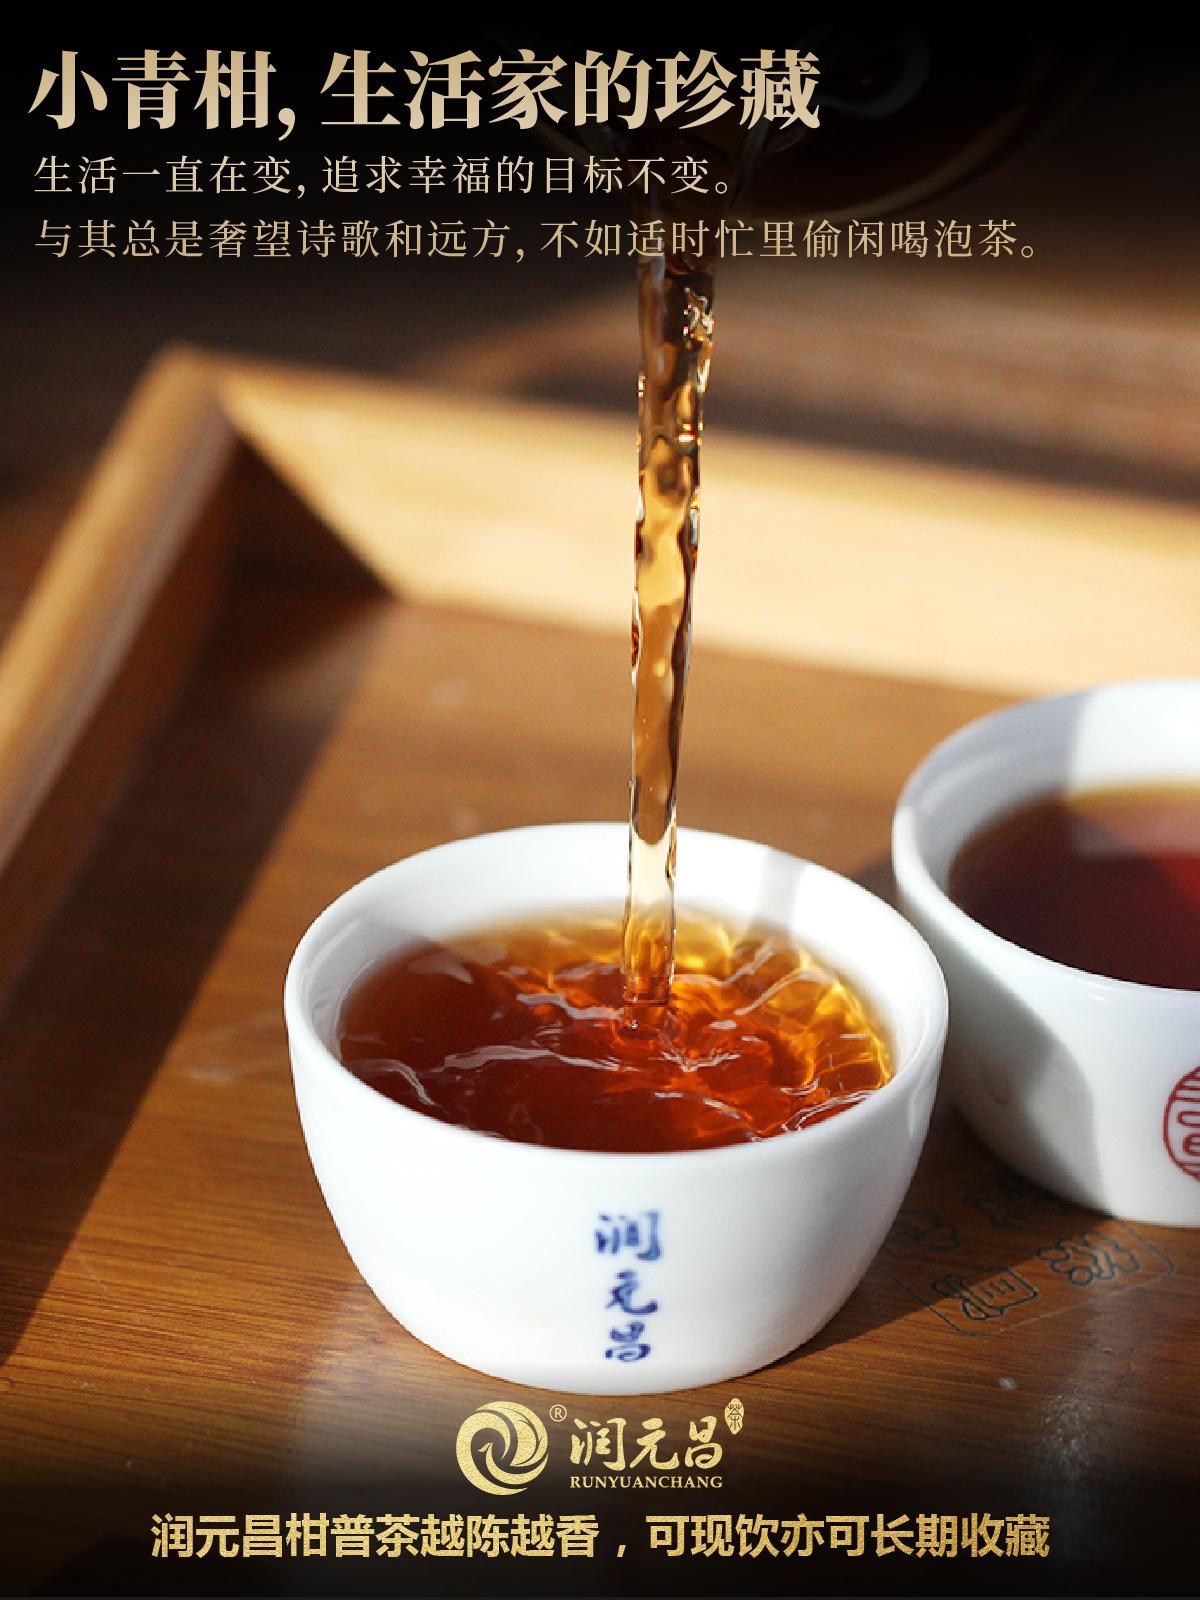 小青柑煮泡方法